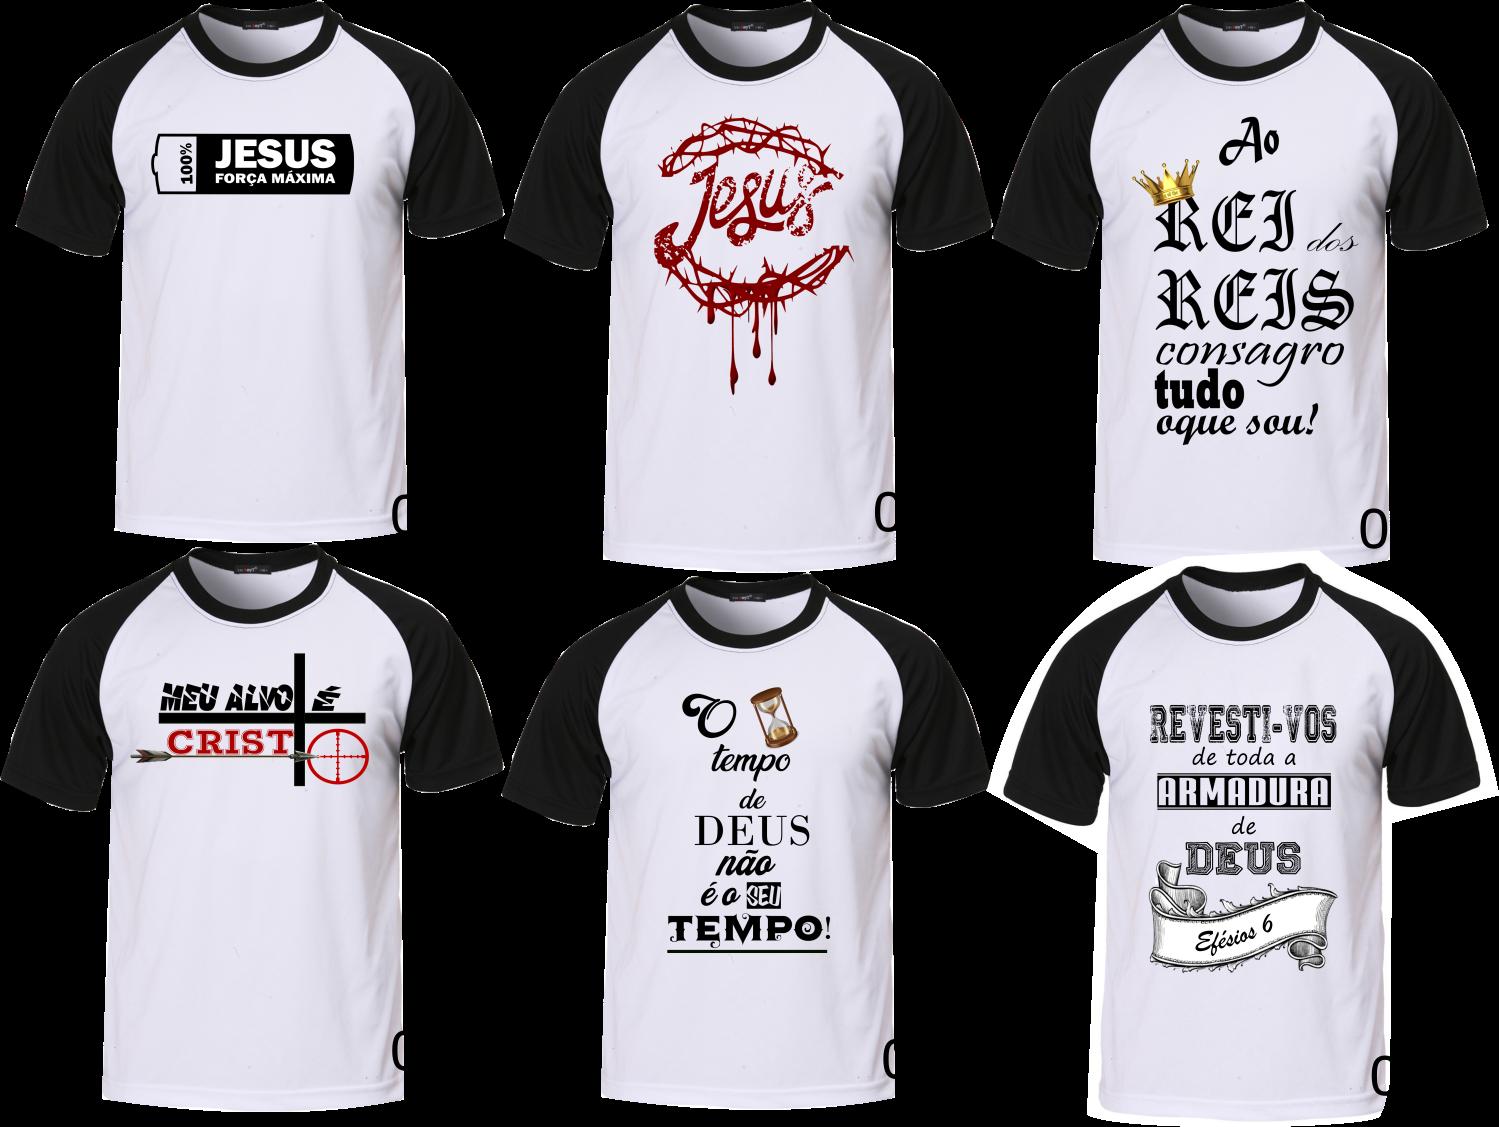 d6c527bc15 Camiseta Evangélica - Moda Gospel Camisetas Com Frases Evangelicas